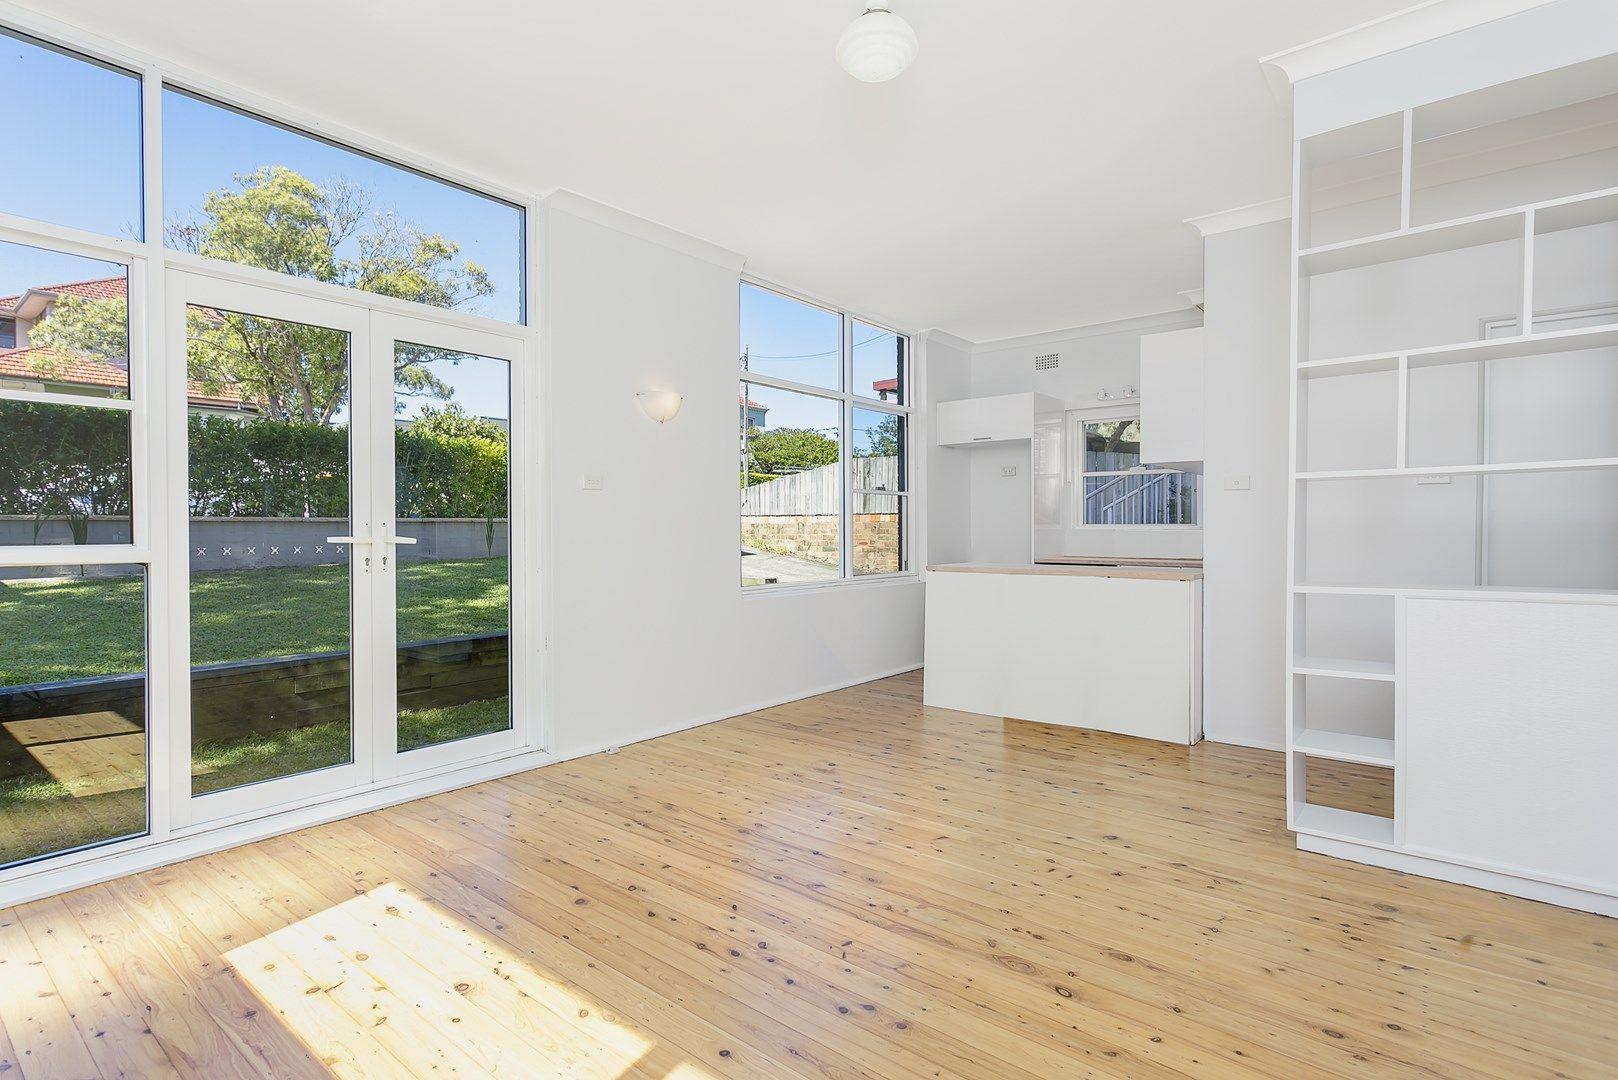 1/42 Upper Beach Street, Balgowlah NSW 2093, Image 0